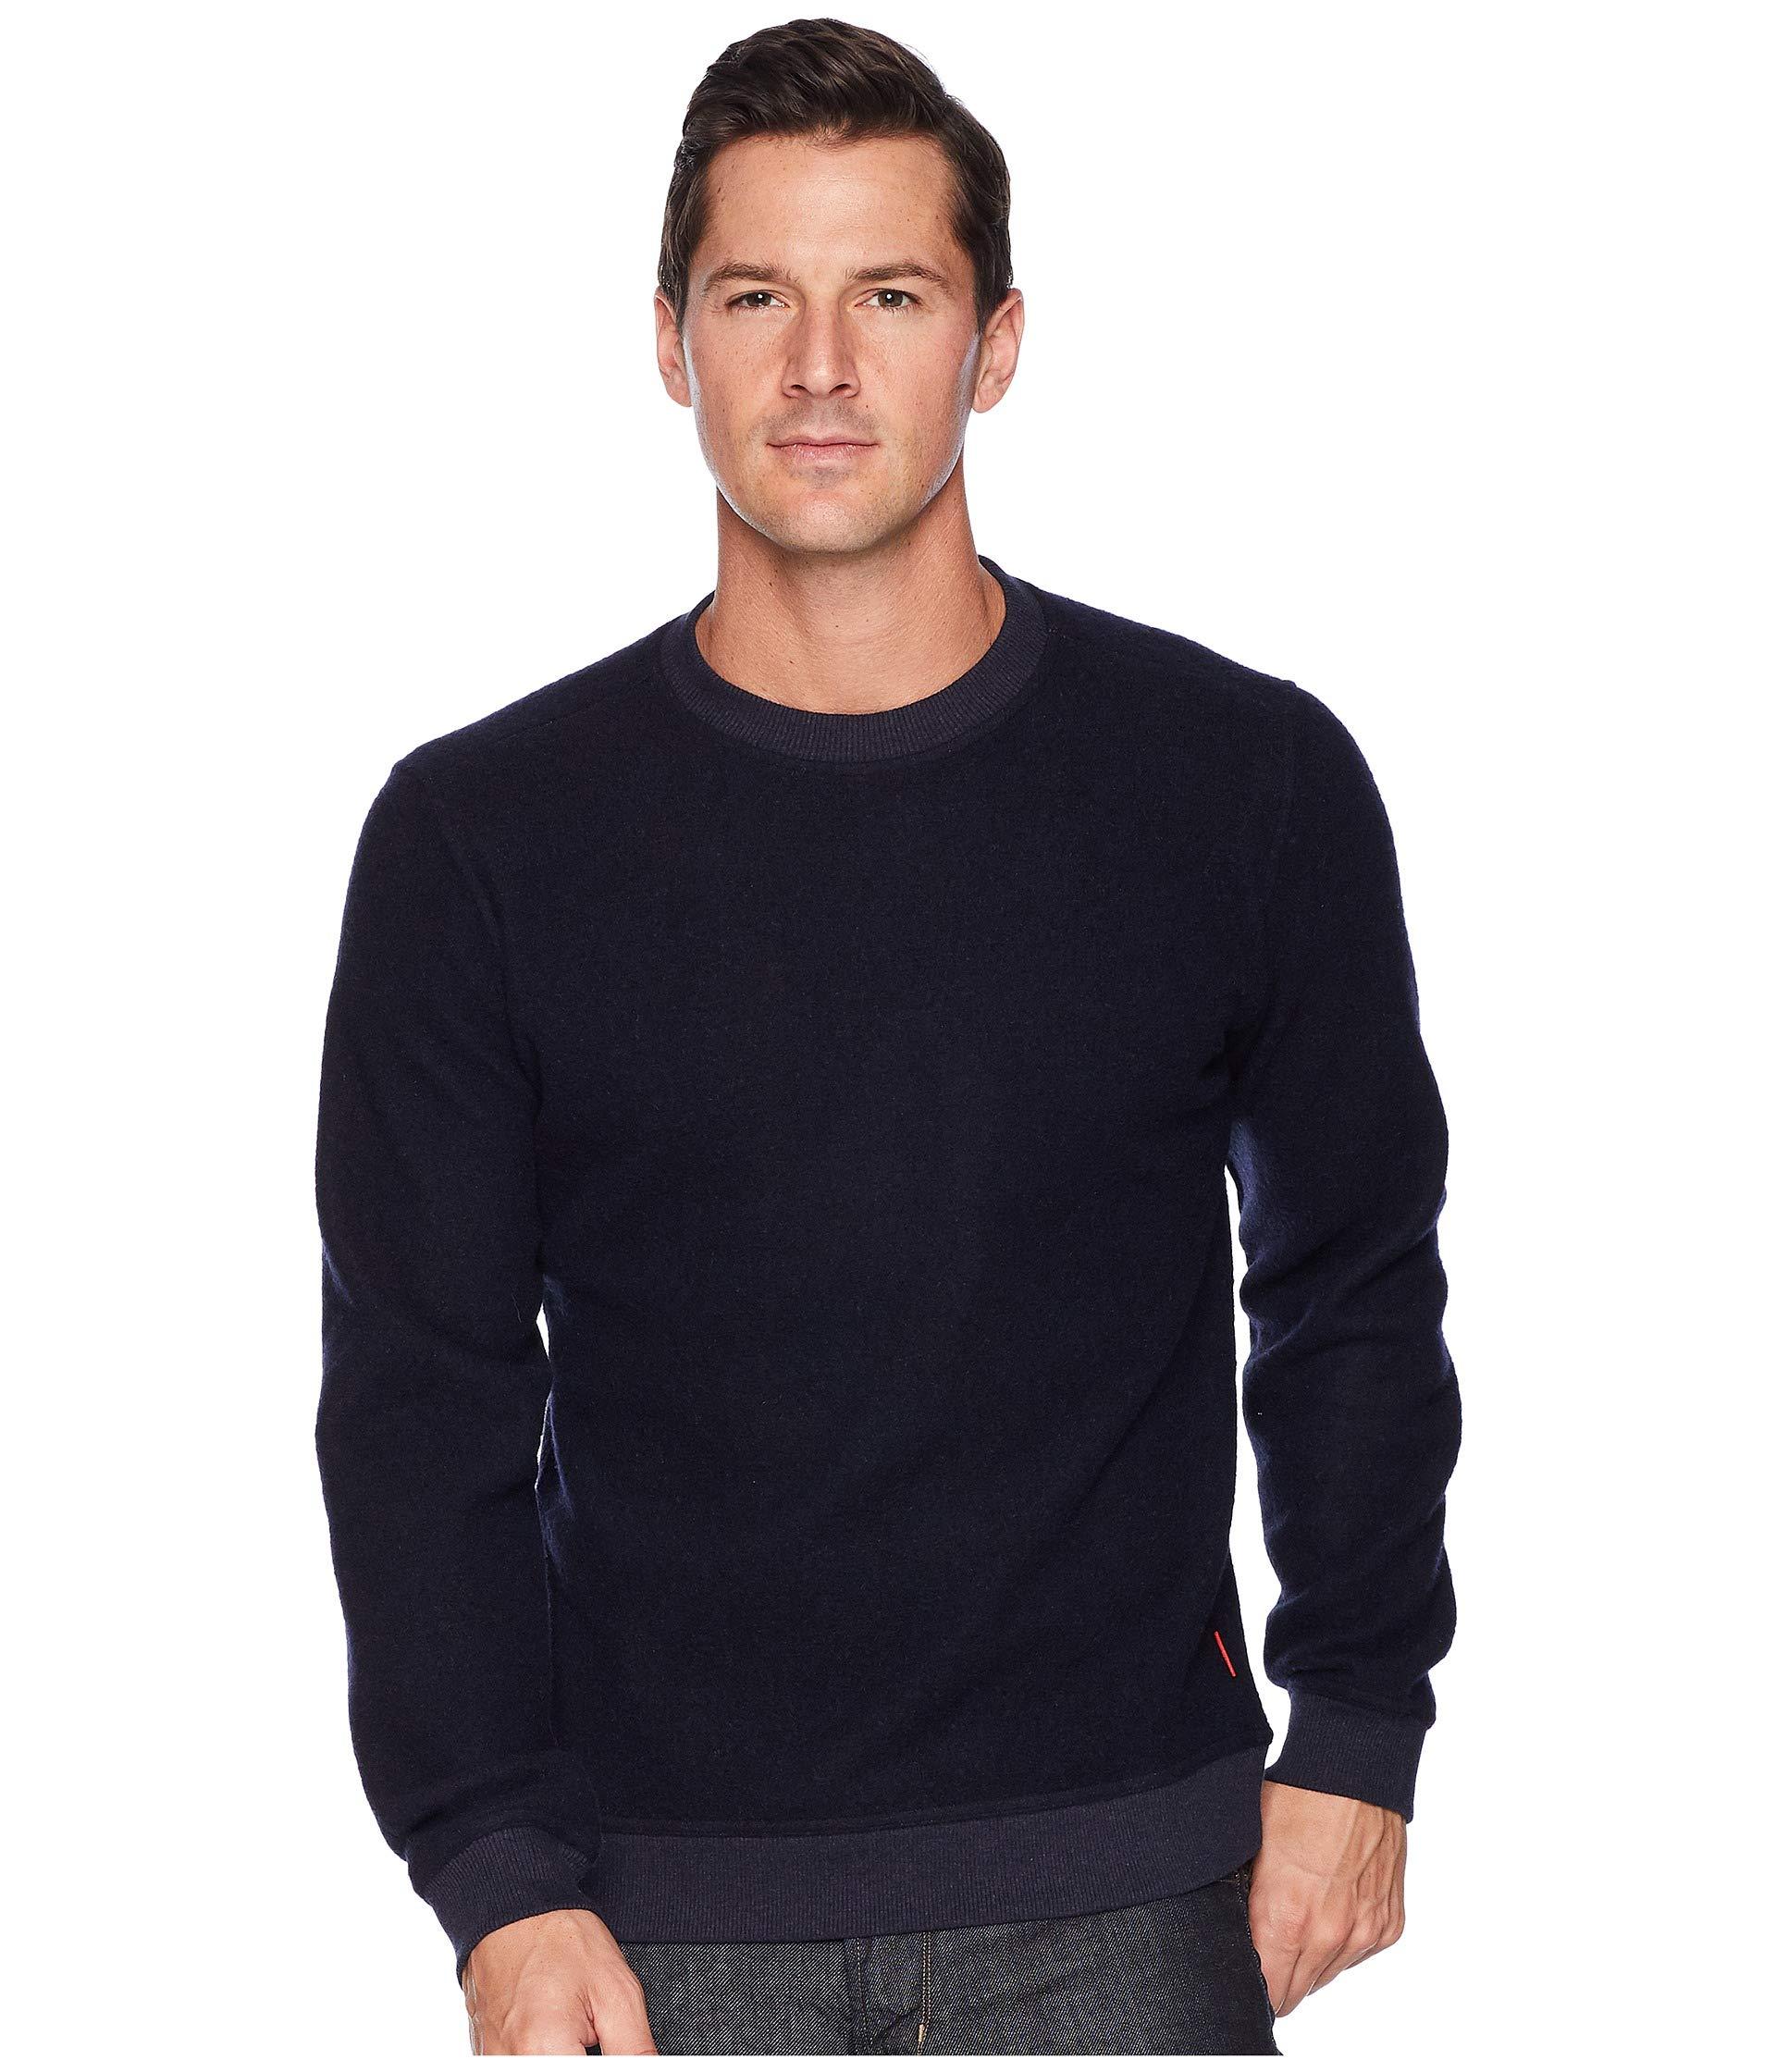 Sweater Topo Sweater Navy Global Designs Topo Navy Designs Topo Global qXXHr8wA